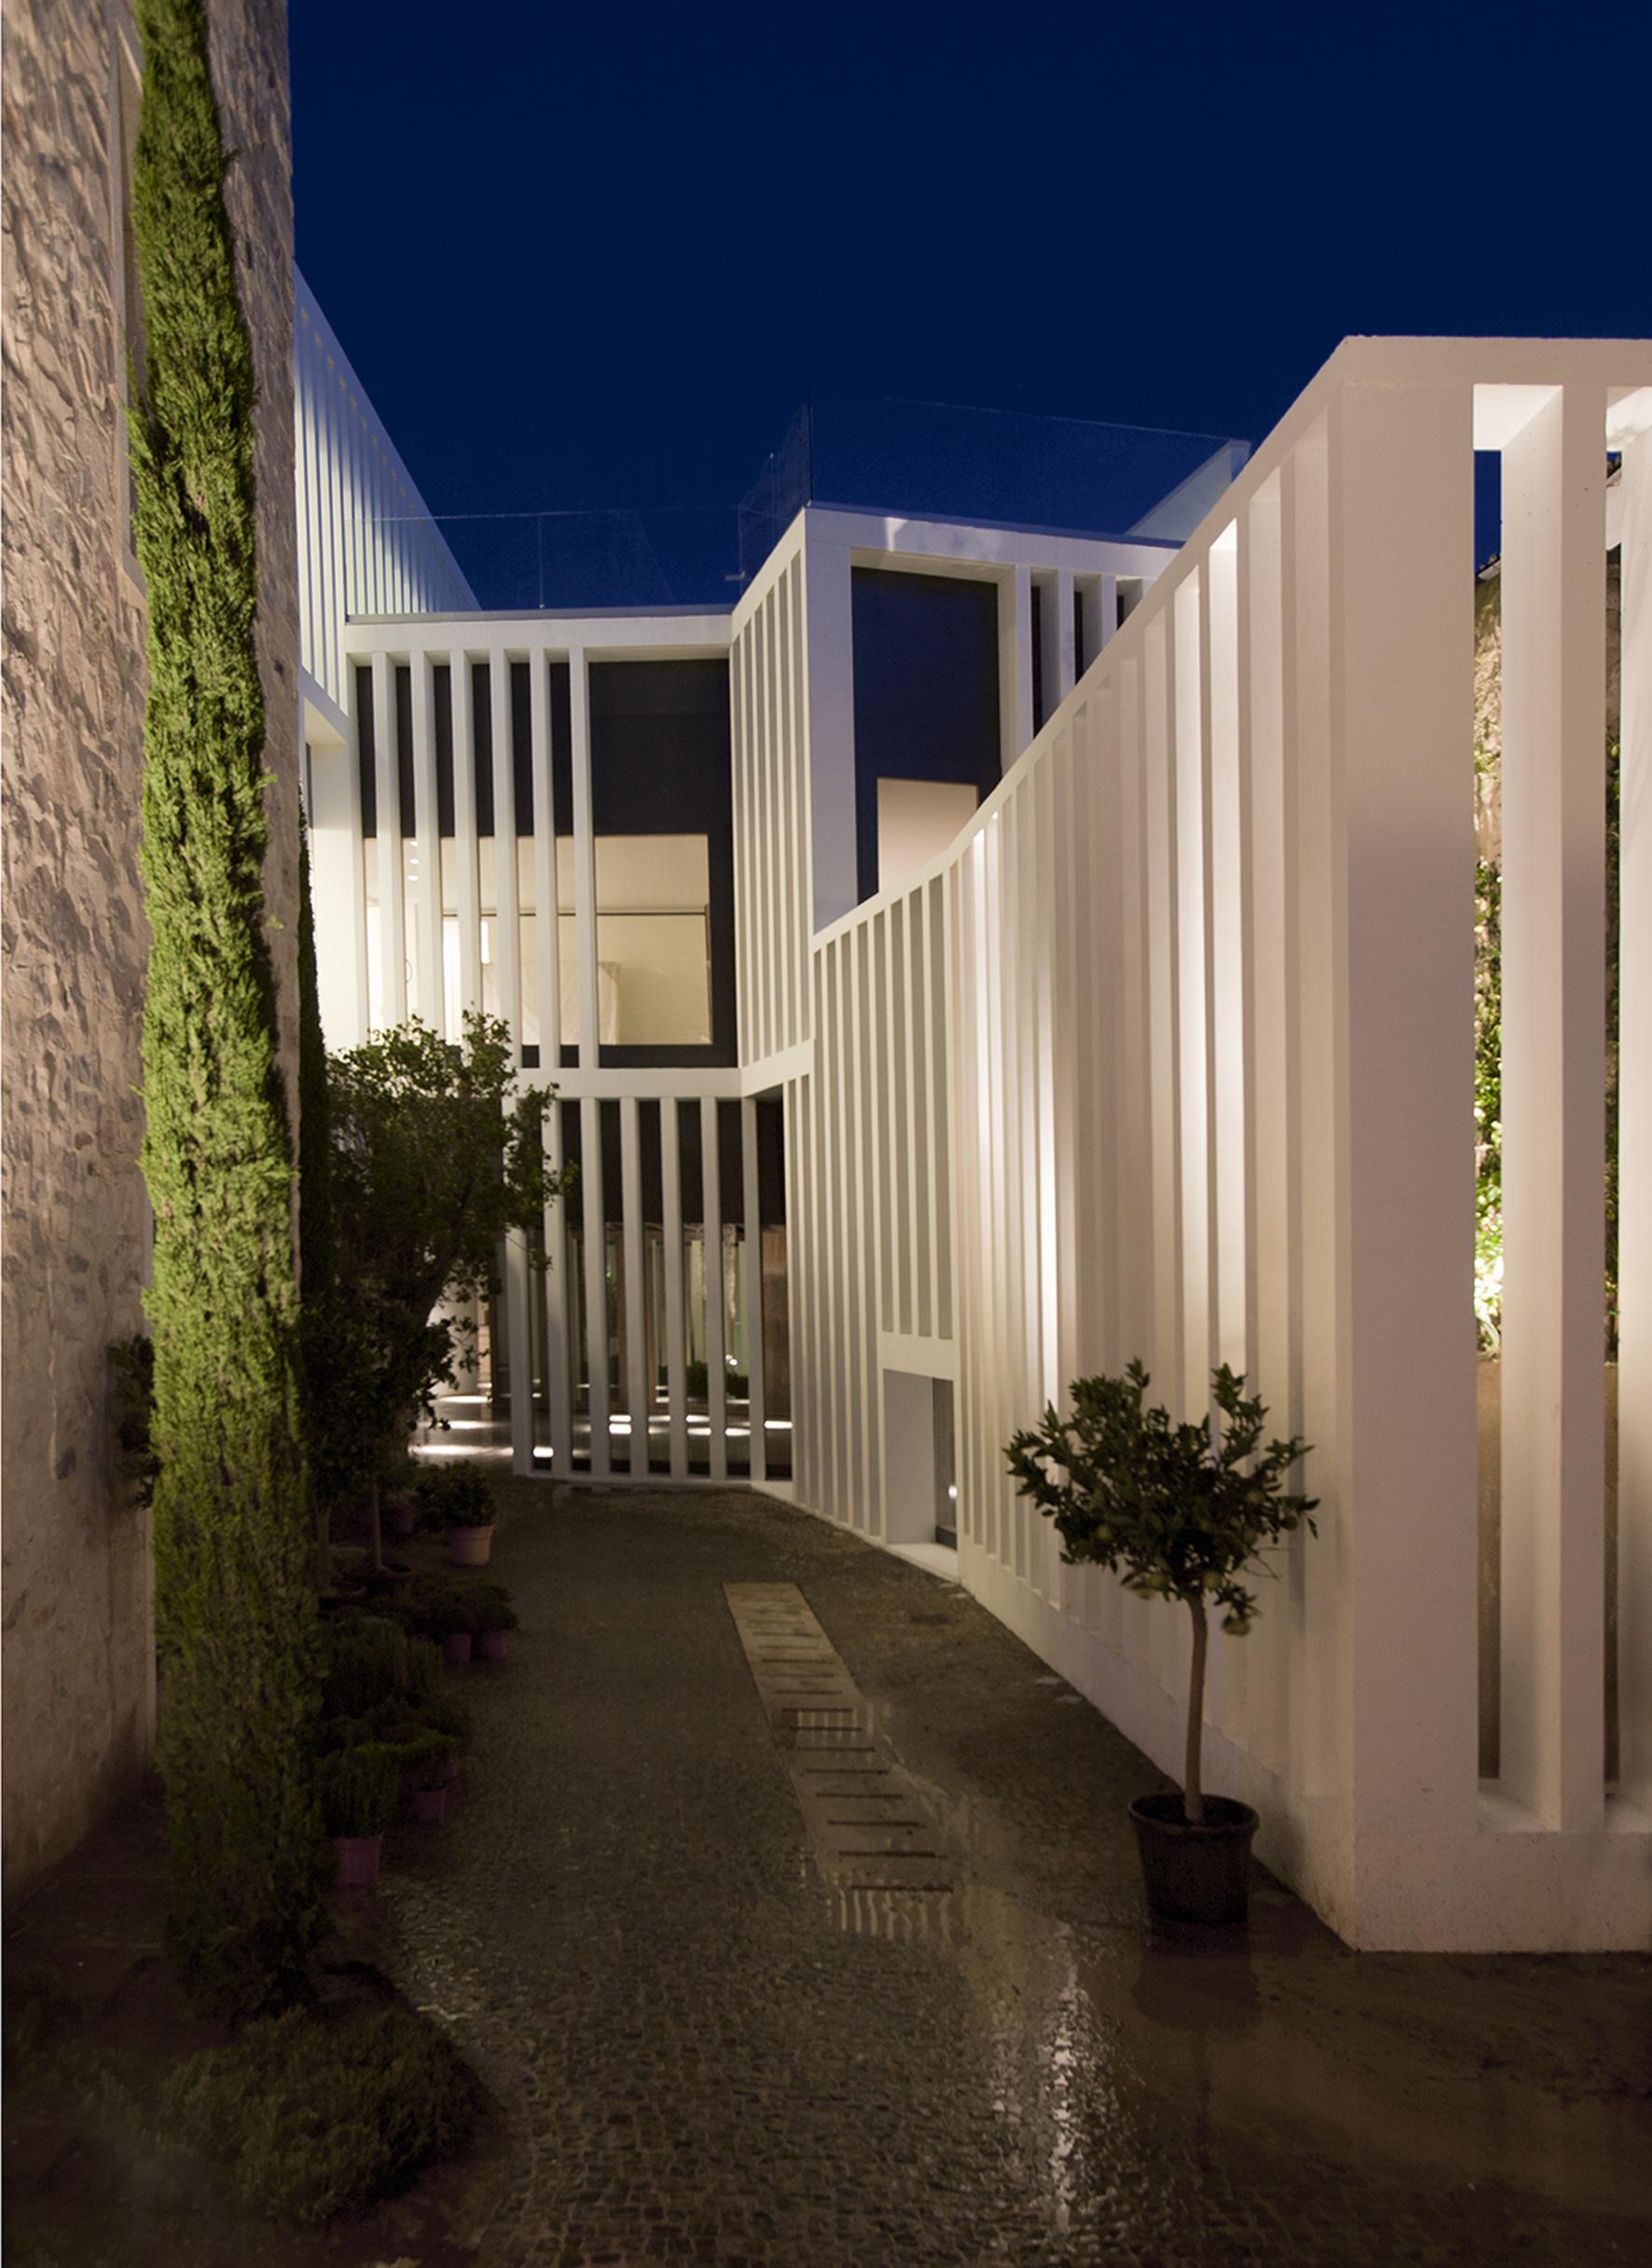 Hotel atrio relais chateaux ayuntamiento de c ceres - Www relaischateaux com creation ...